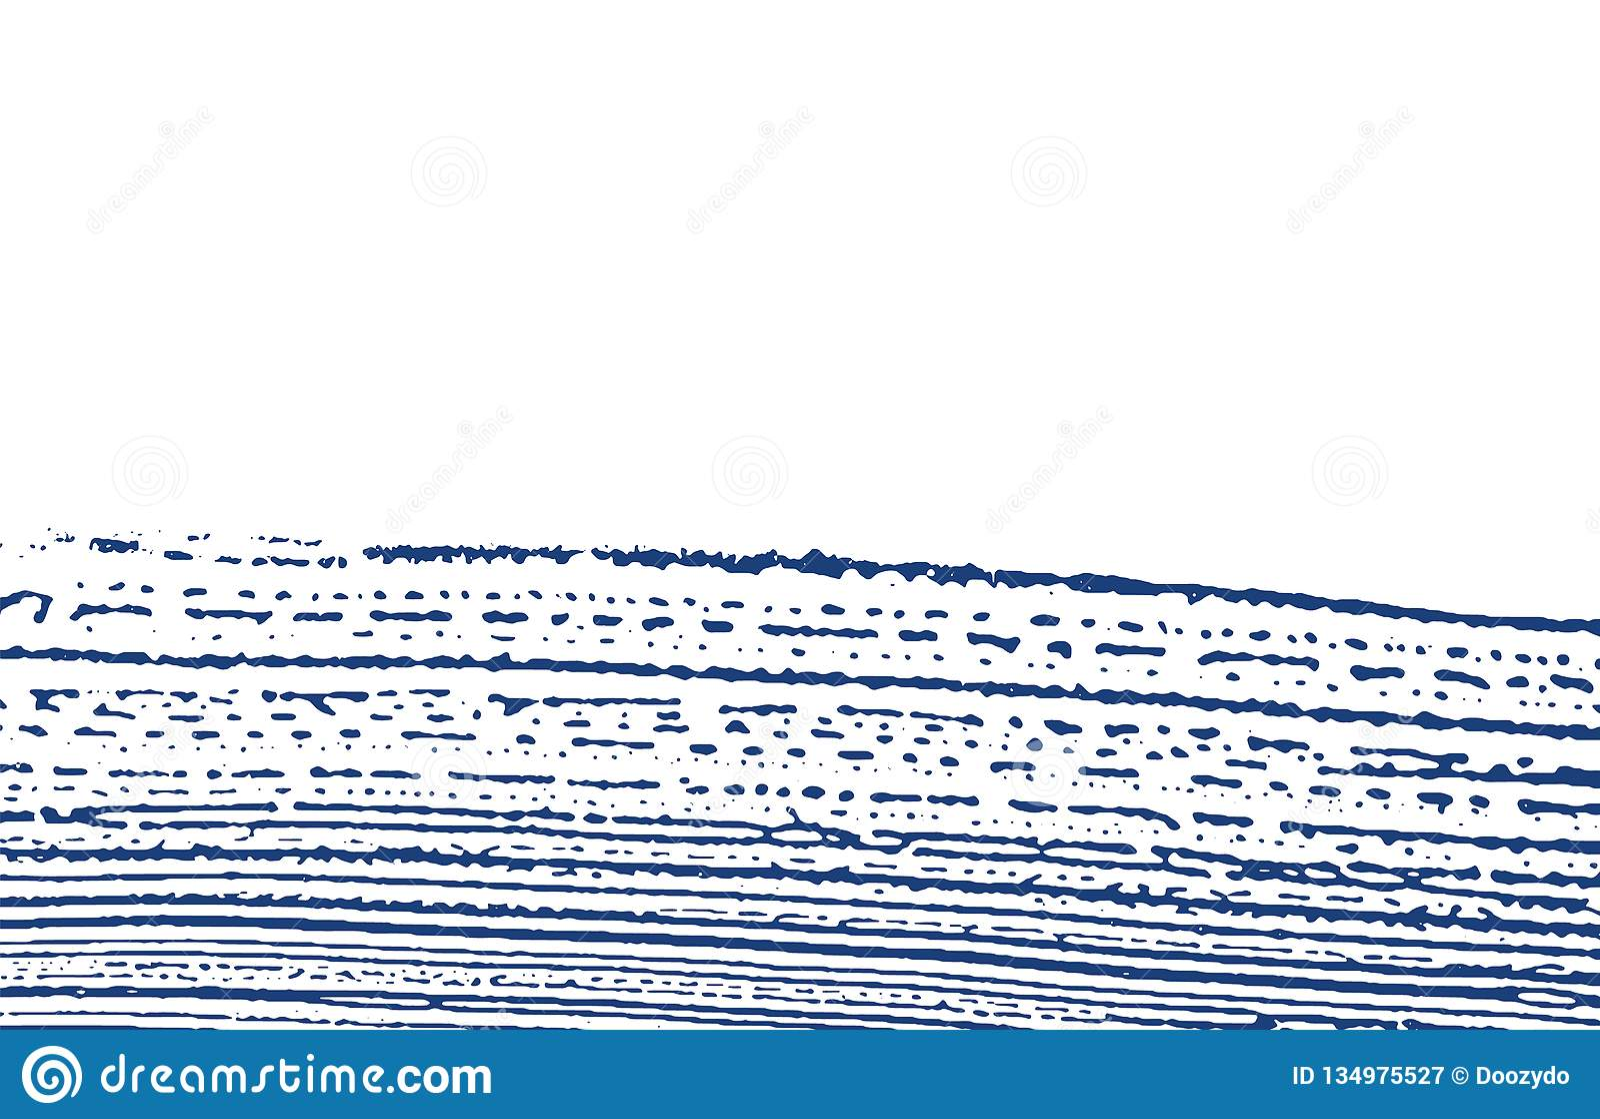 Grunge纹理 困厄靛蓝概略的踪影 Divin